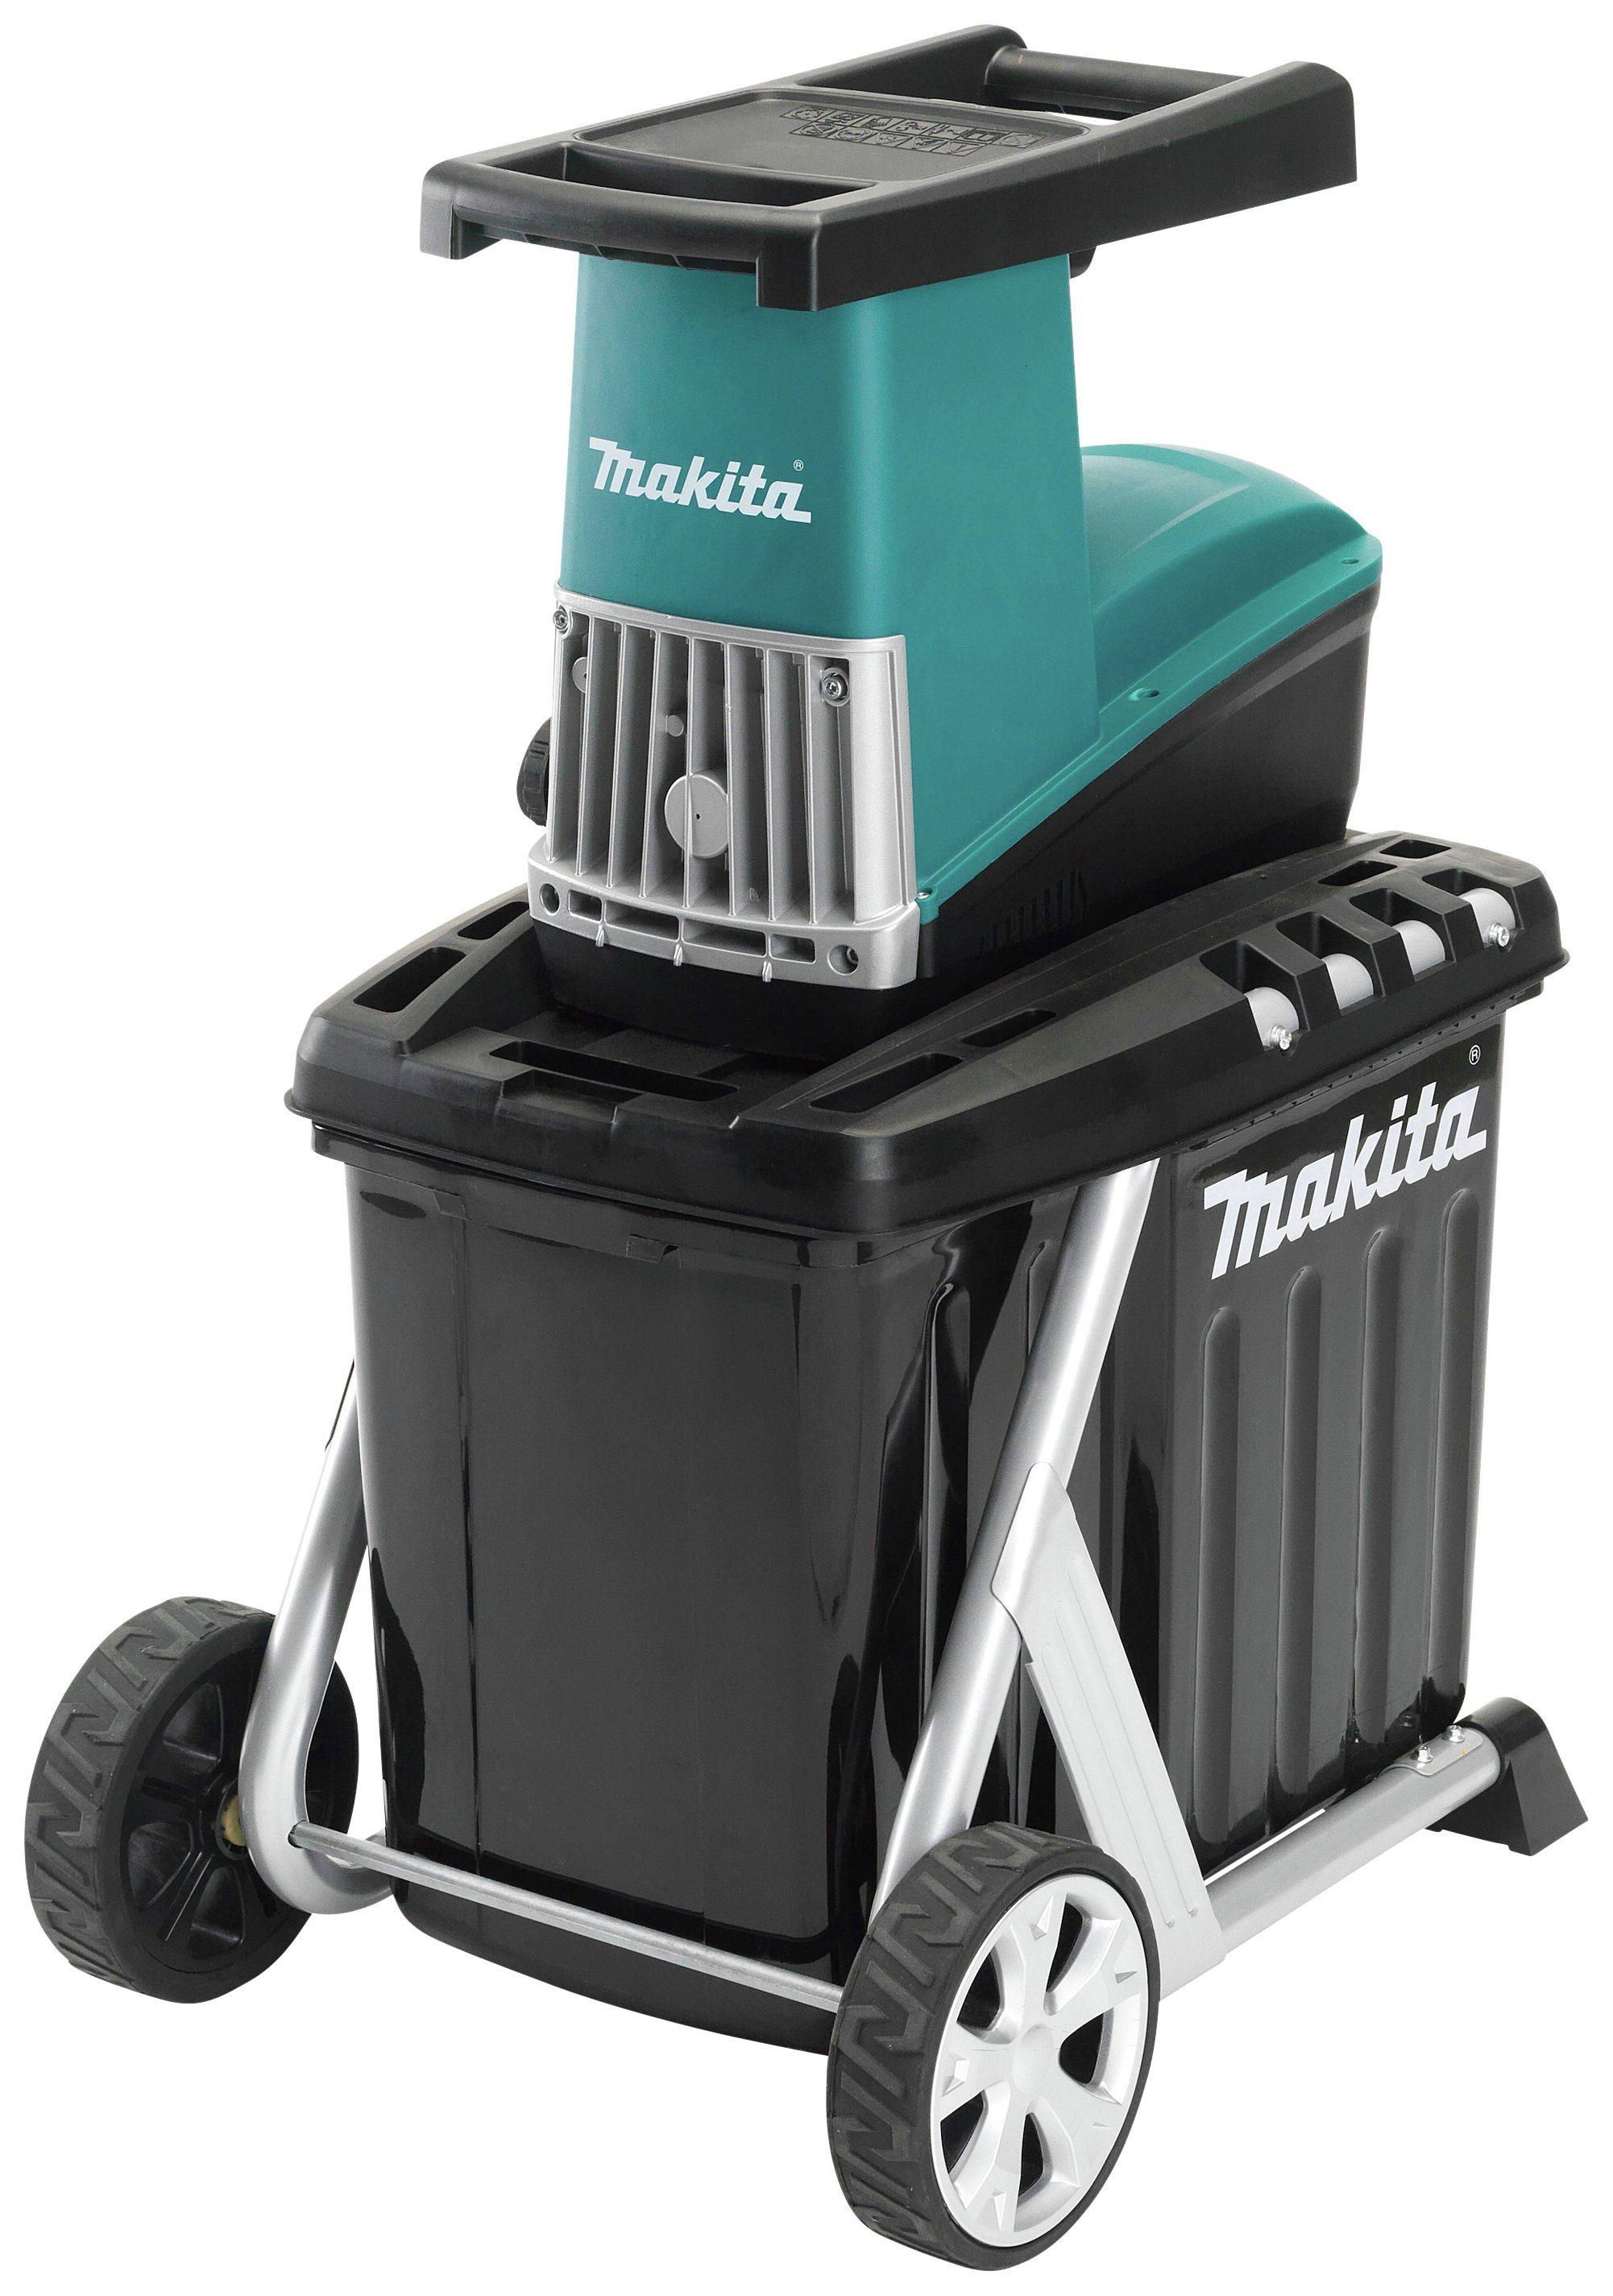 Image of Makita - UD2500 Garden Shredder